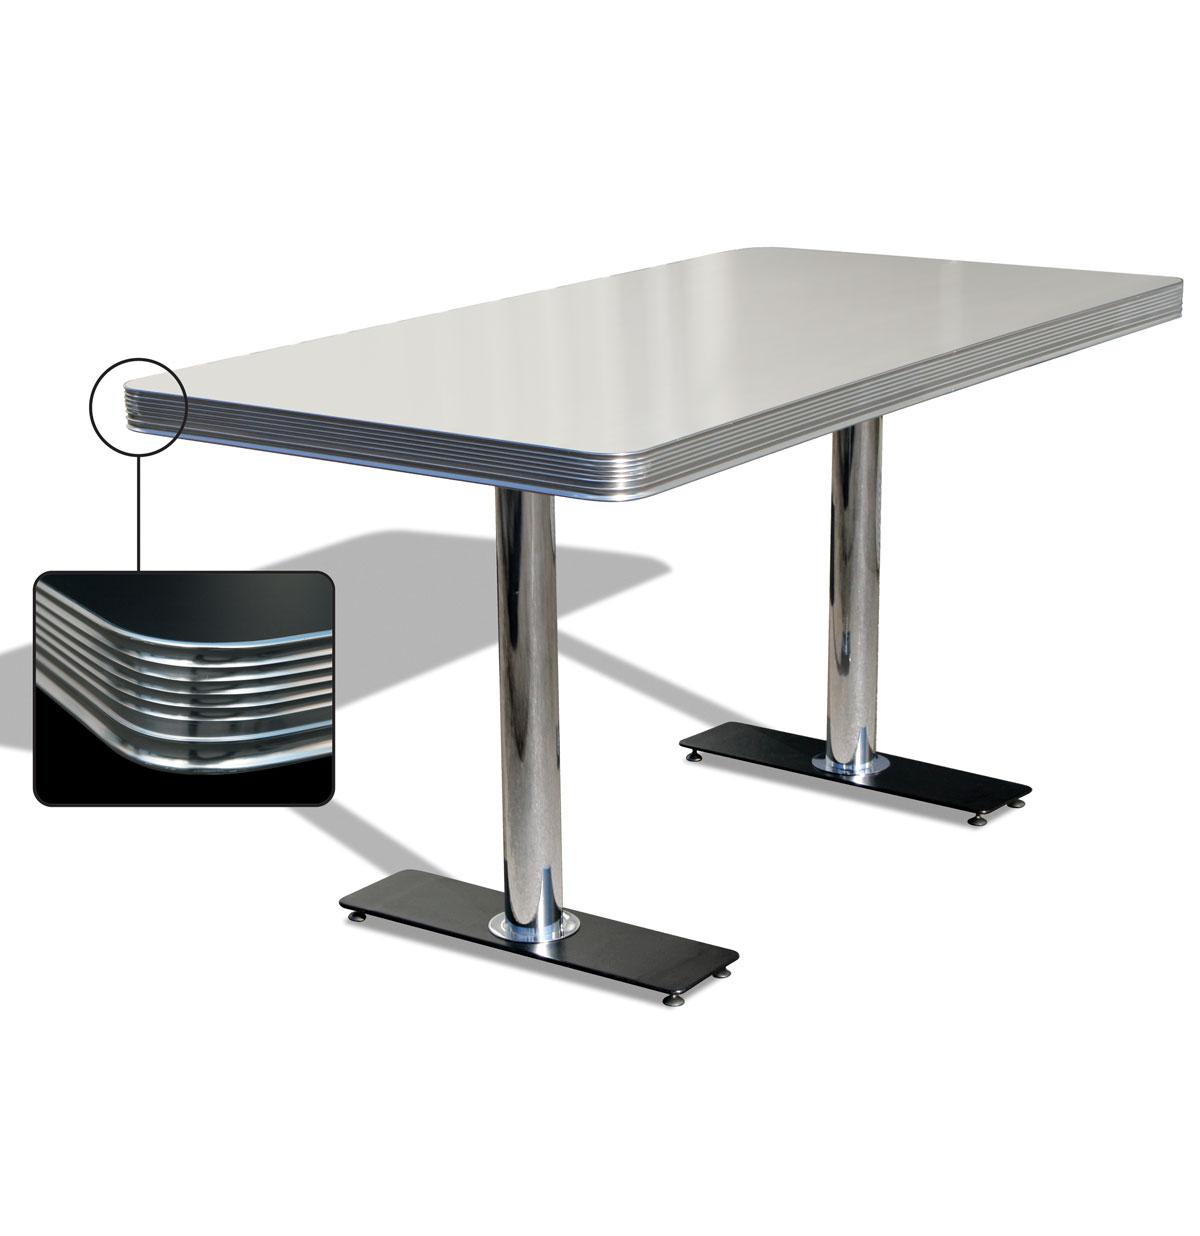 Bel-Air Diner Tafel TO-25W Antique White